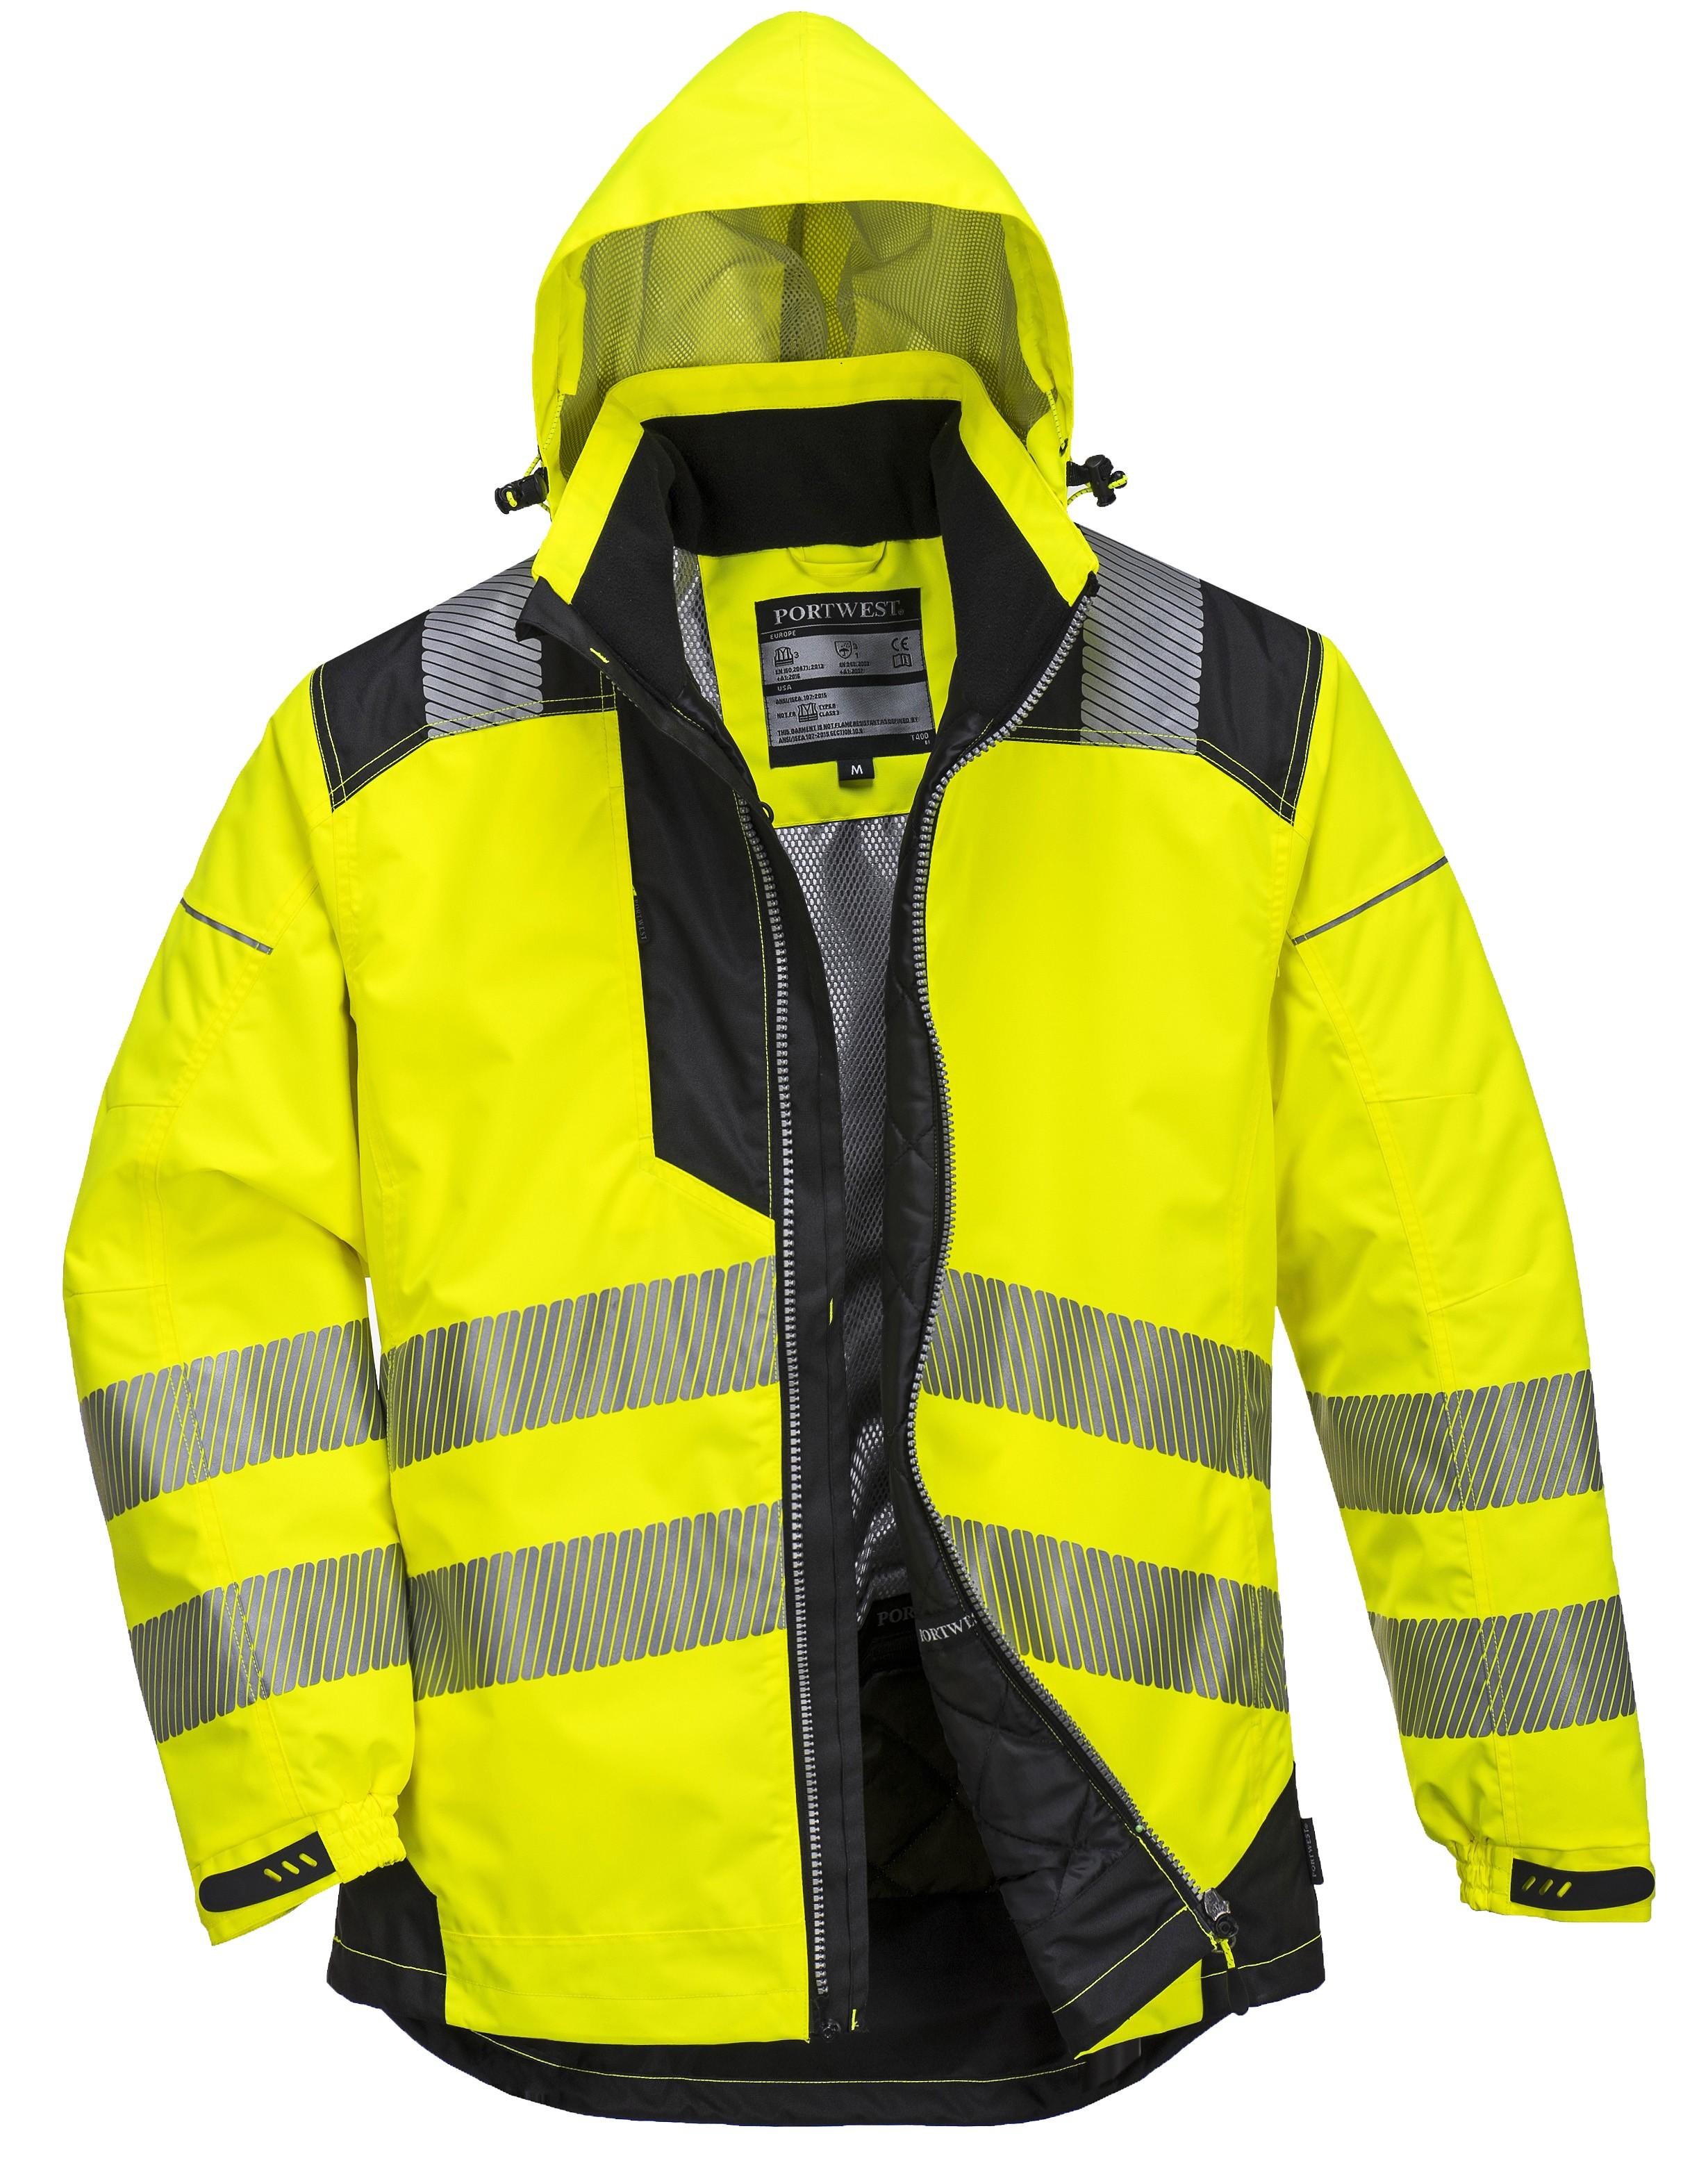 bfdec4d3f9 Μπουφάν Φωσφοριζέ αδιάβροχο PortWest T400 Κίτρινο